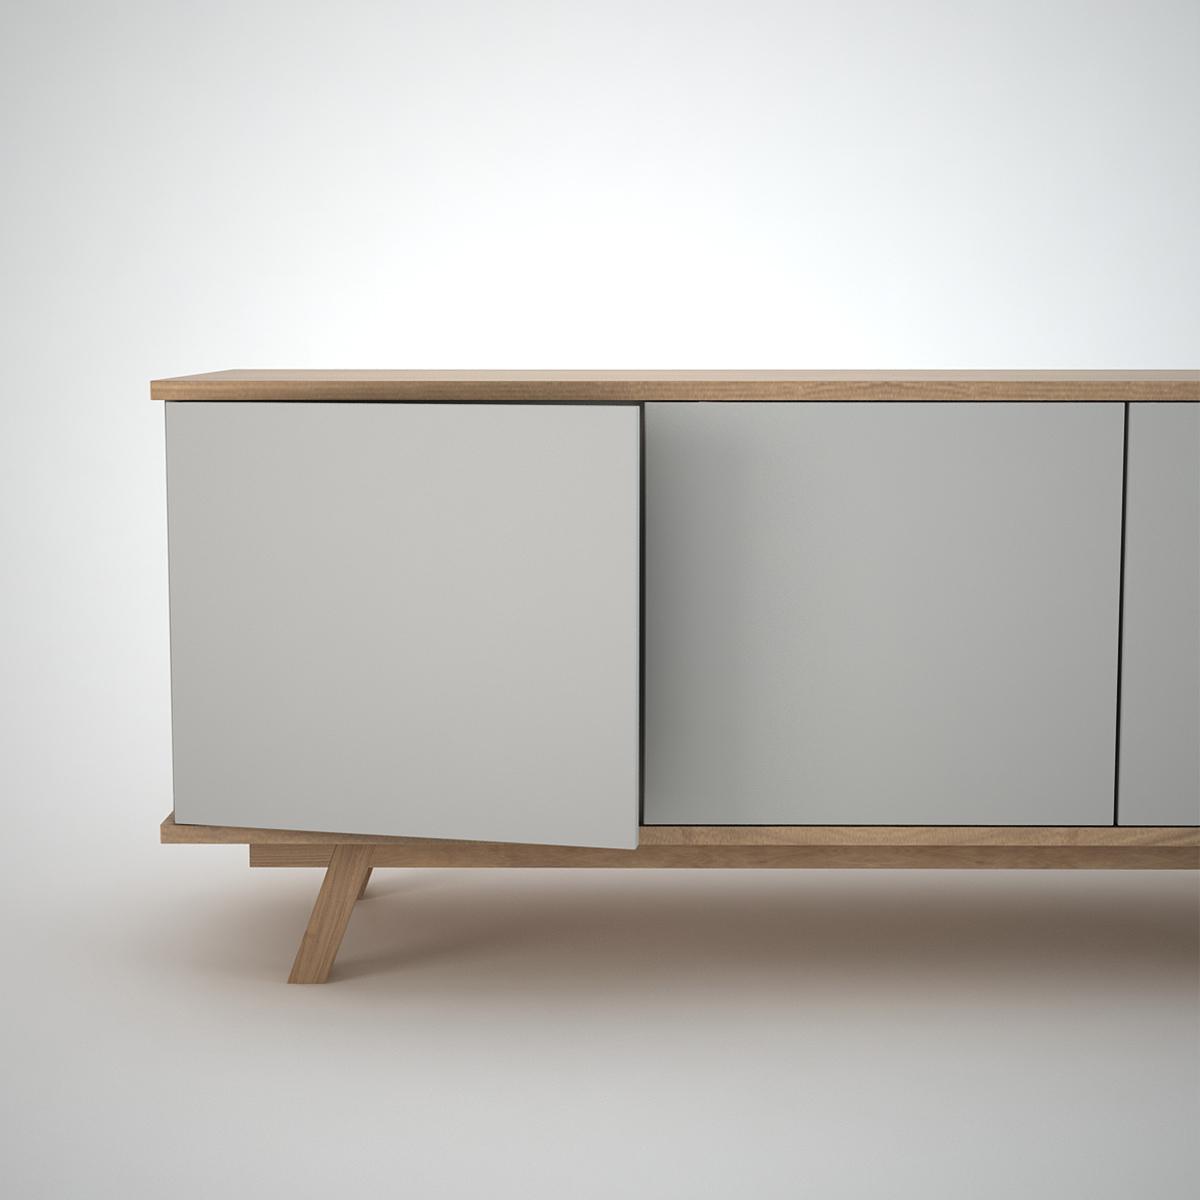 Ottawa sideboard 3 clay join furniture for Sideboard tess 03